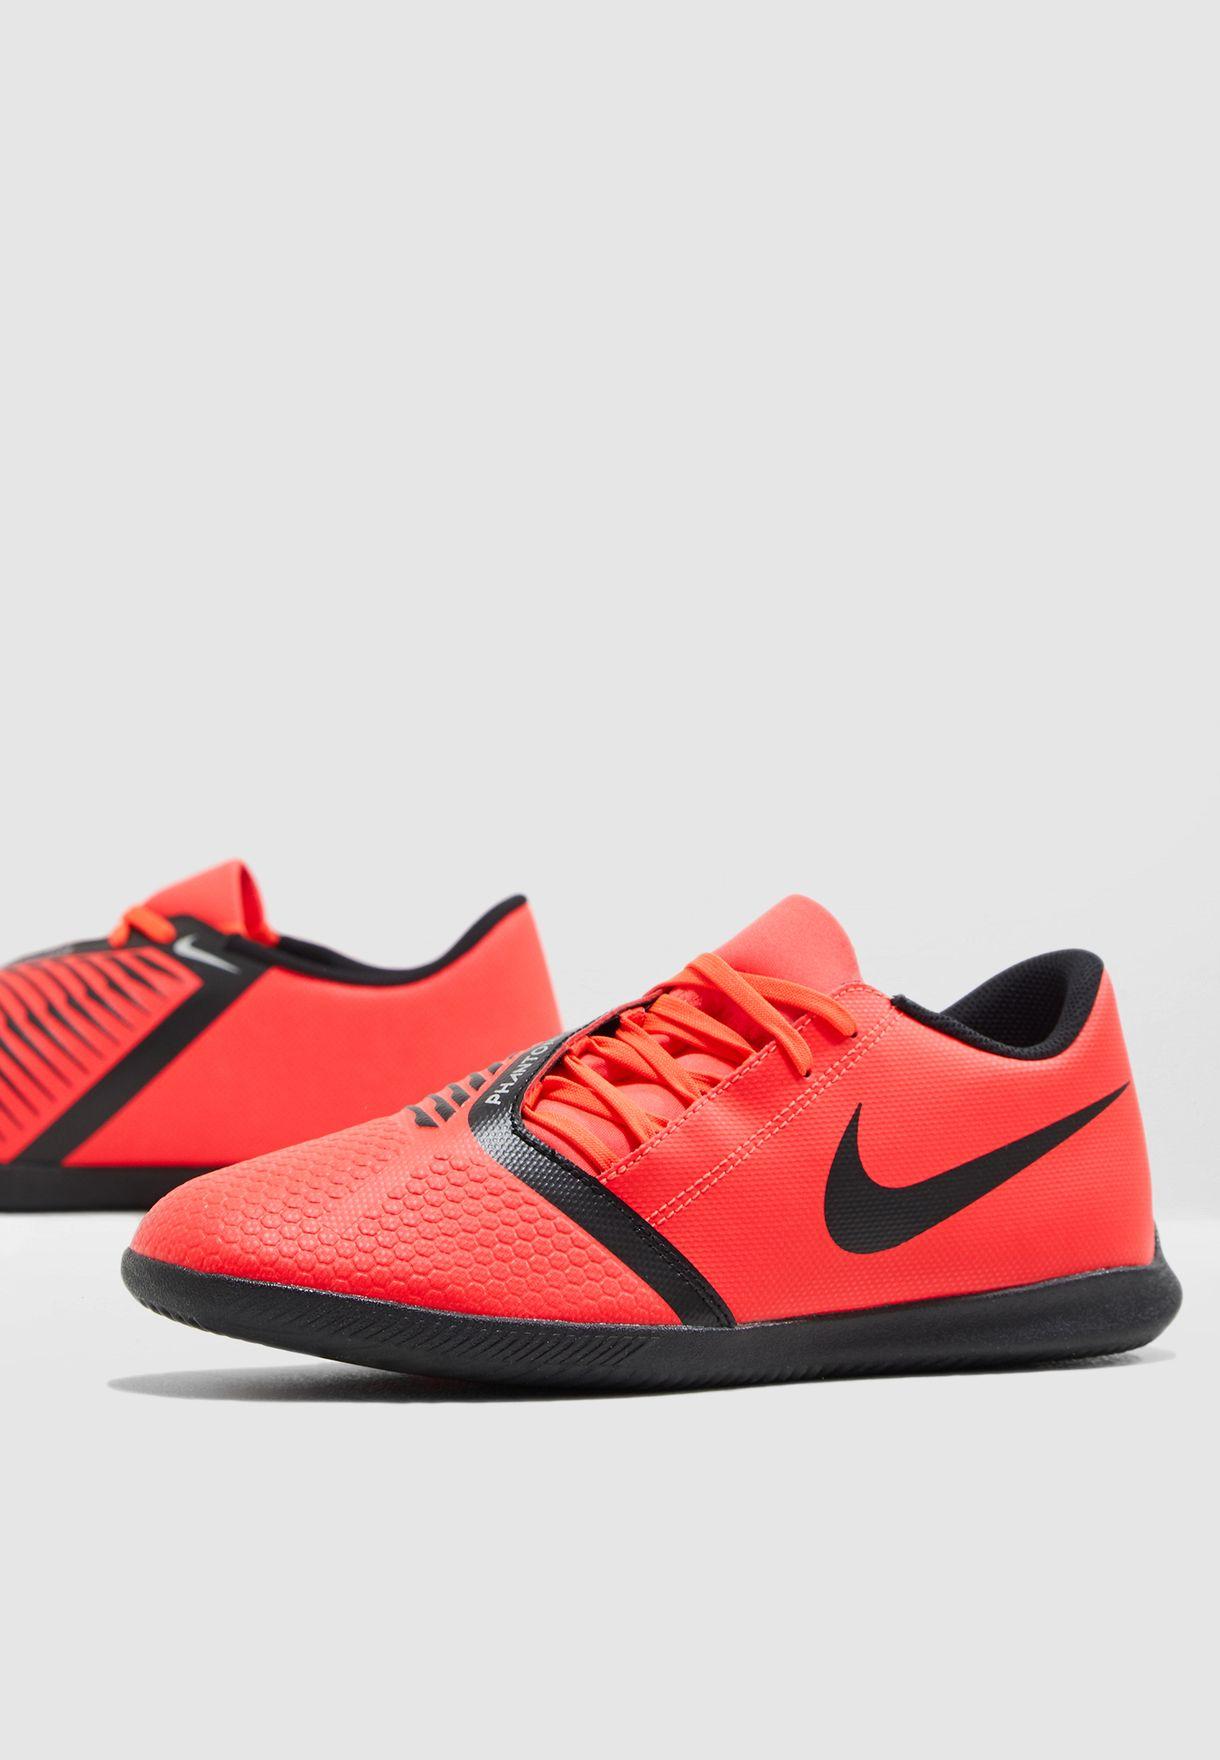 9a060f31d Shop Nike orange Phantom Venom Club IC AO0578-600 for Men in UAE ...